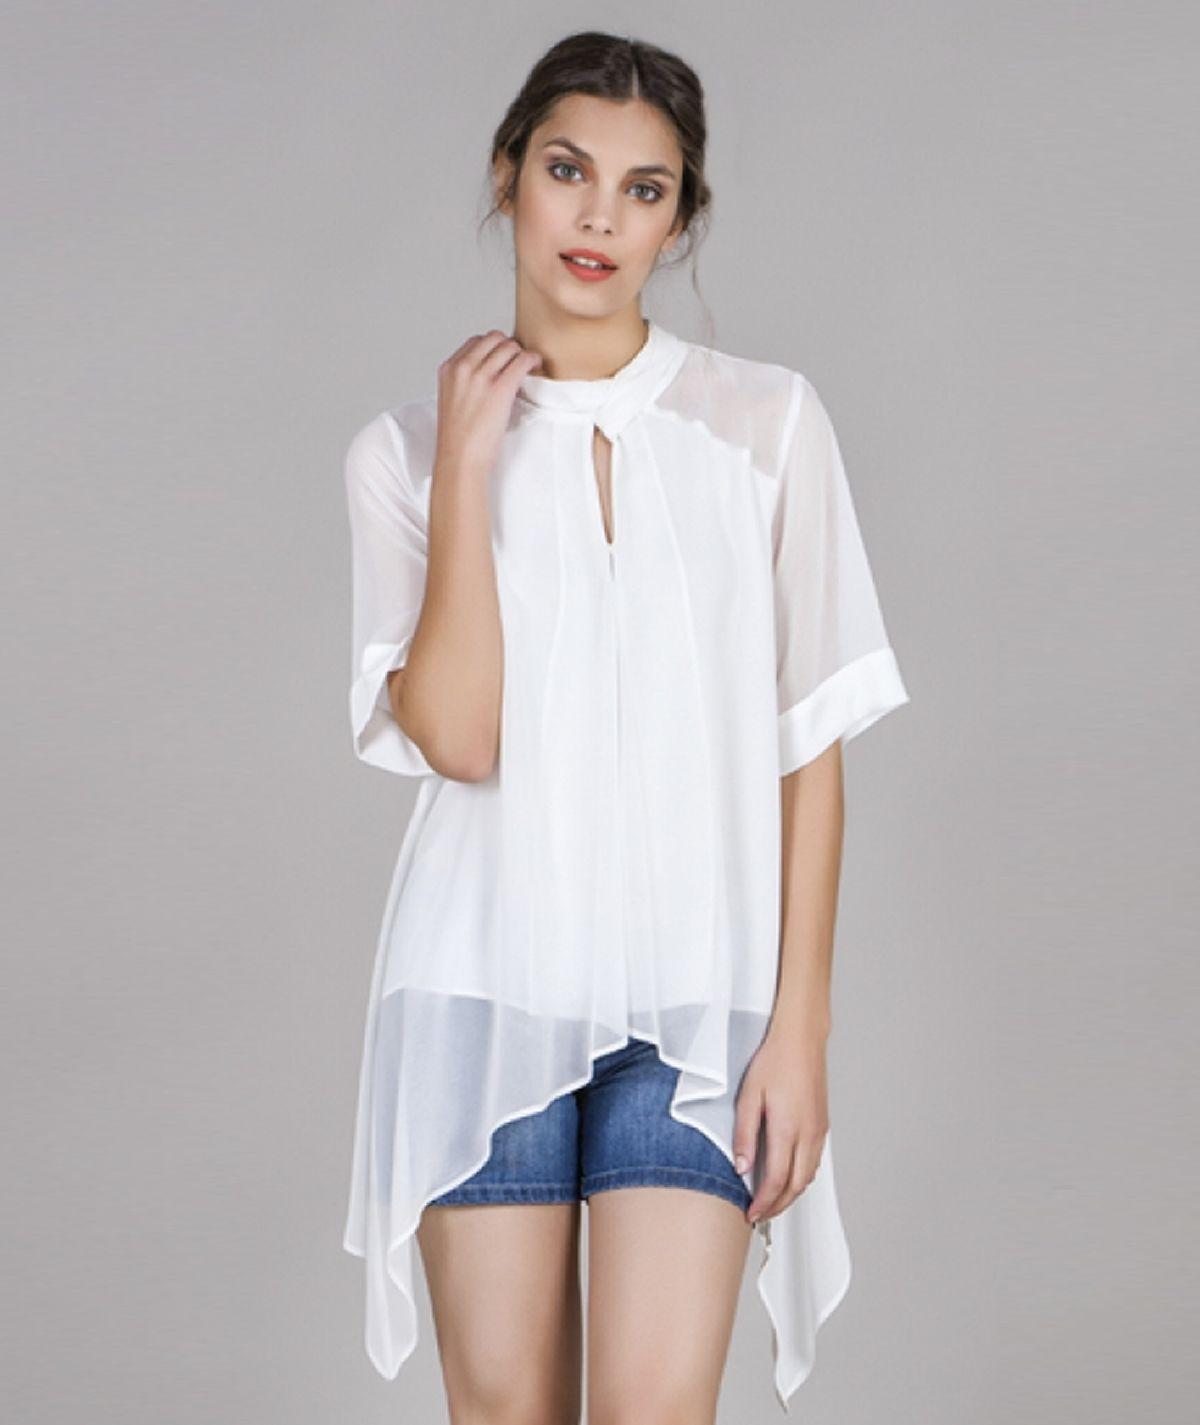 [CHIESSY] Blusa assimétrica